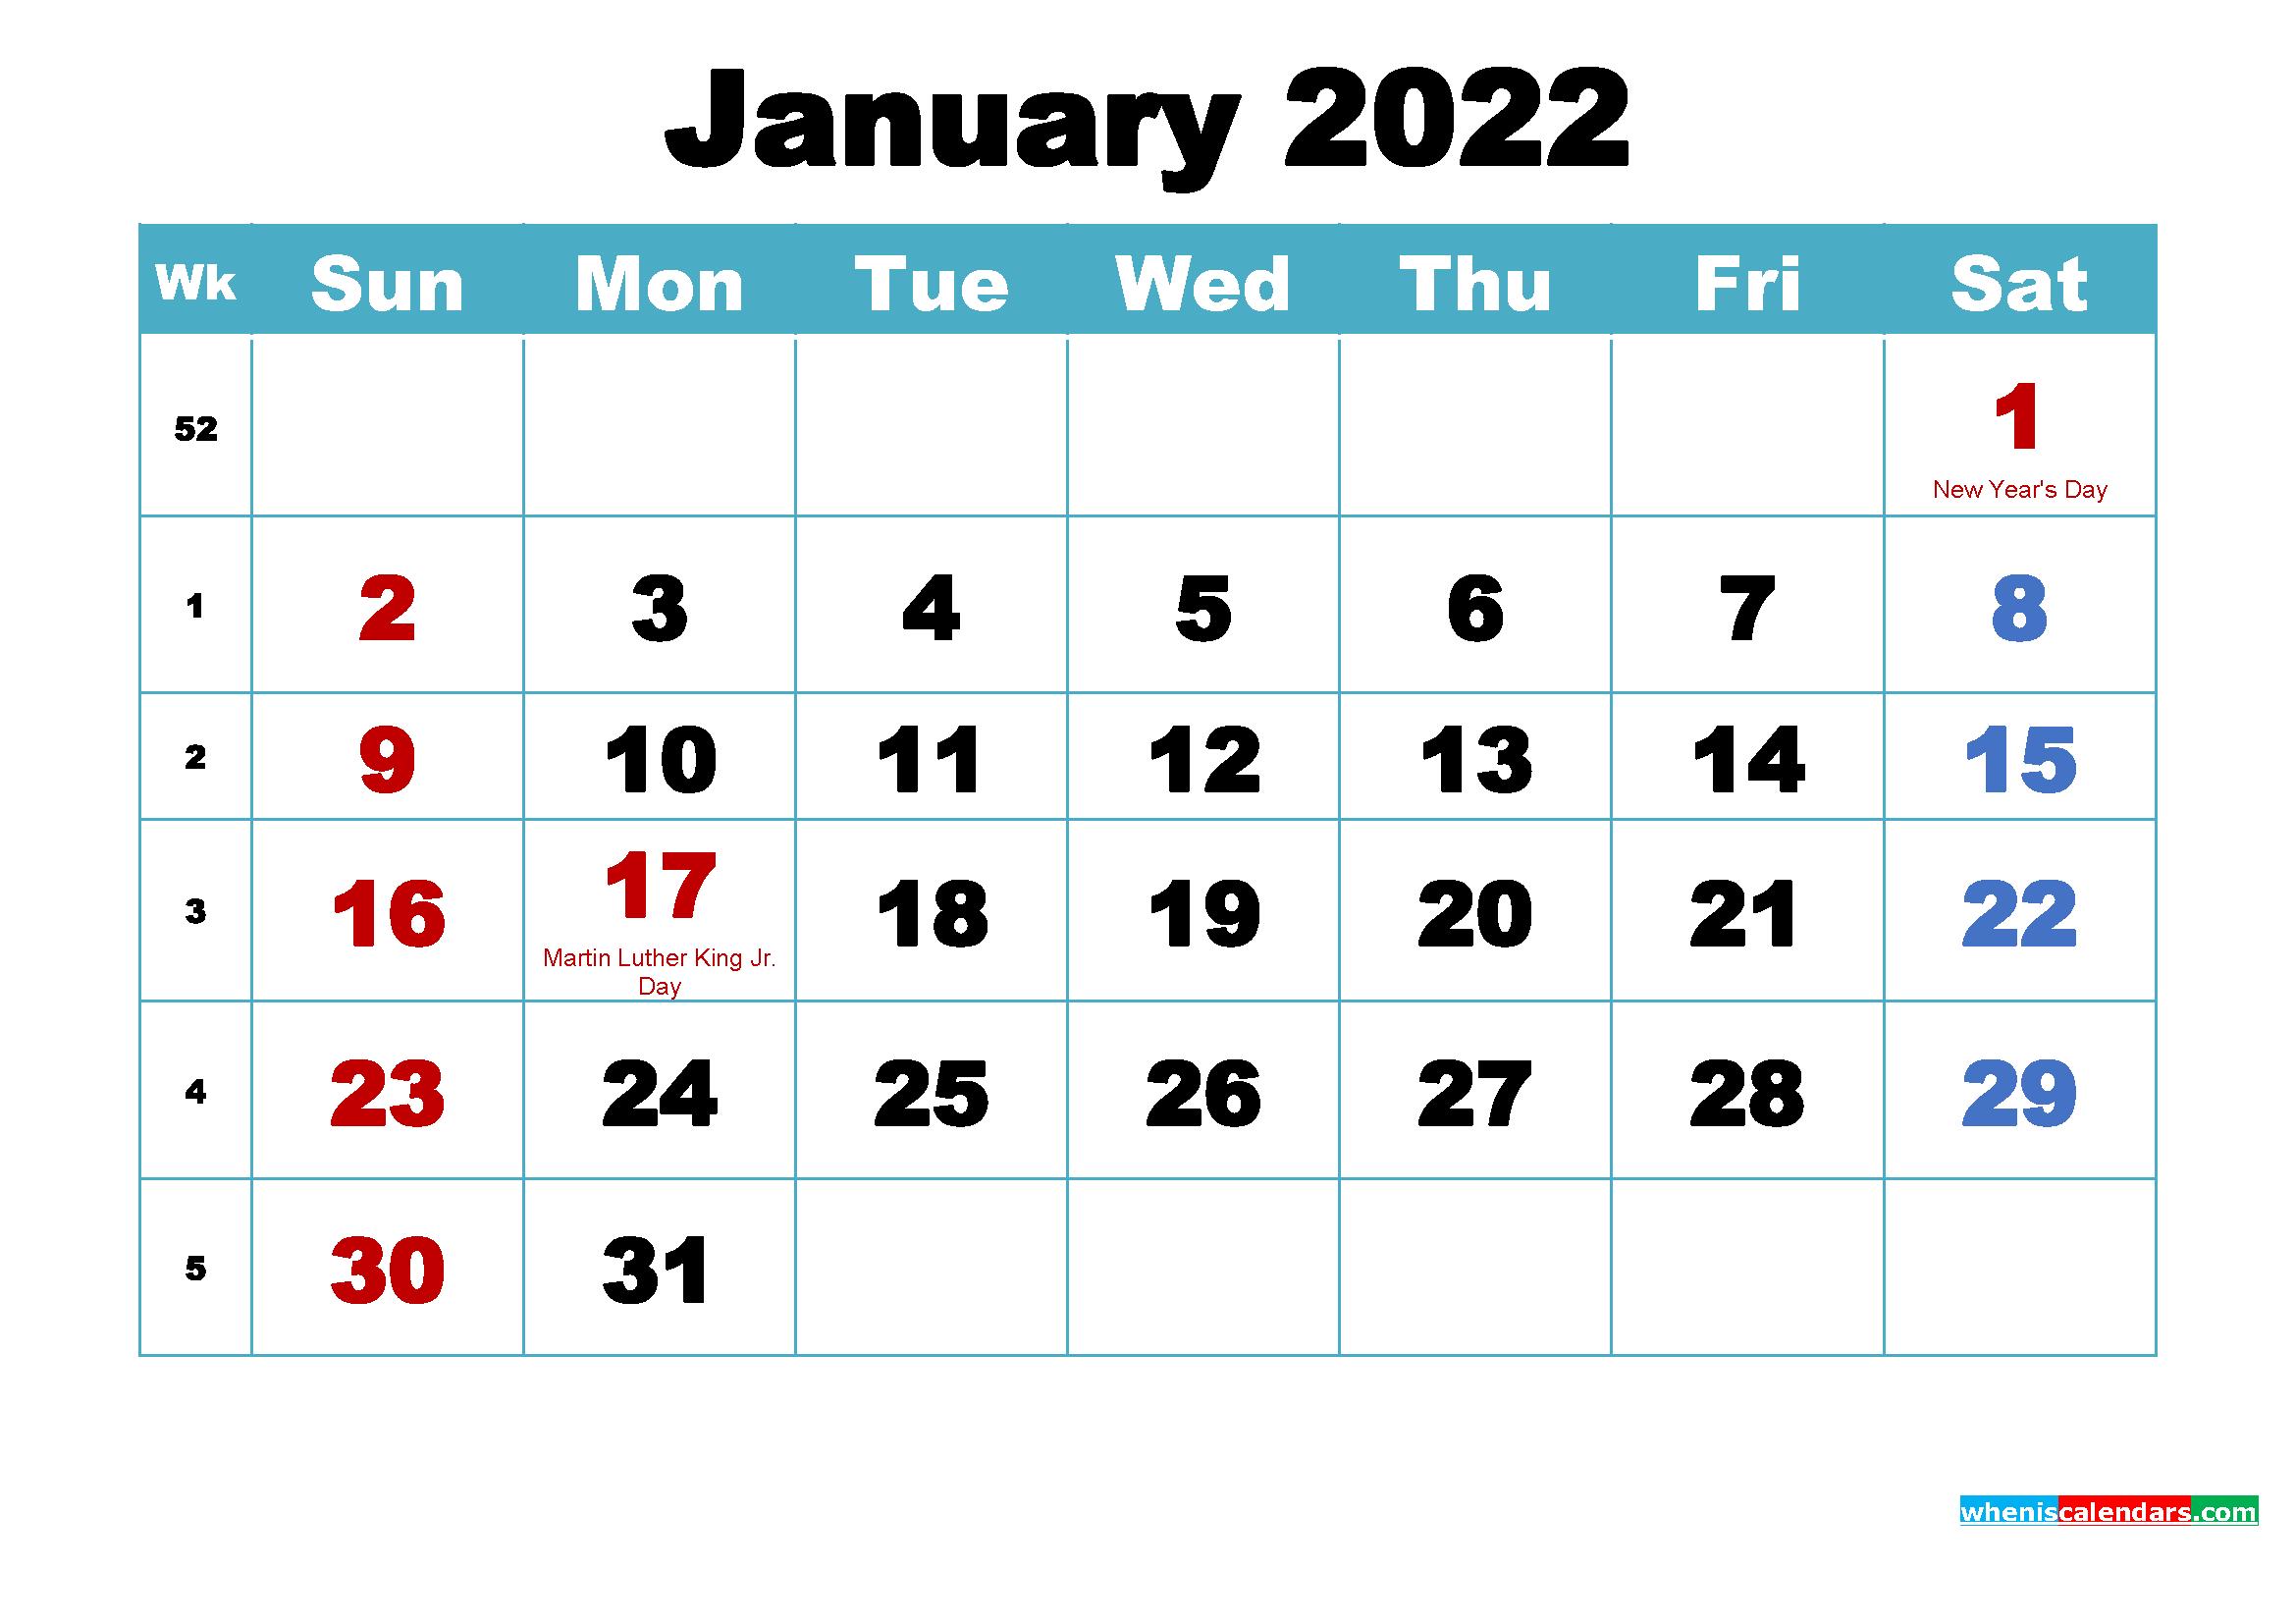 Free Printable 2022 Calendar January as Word, PDF